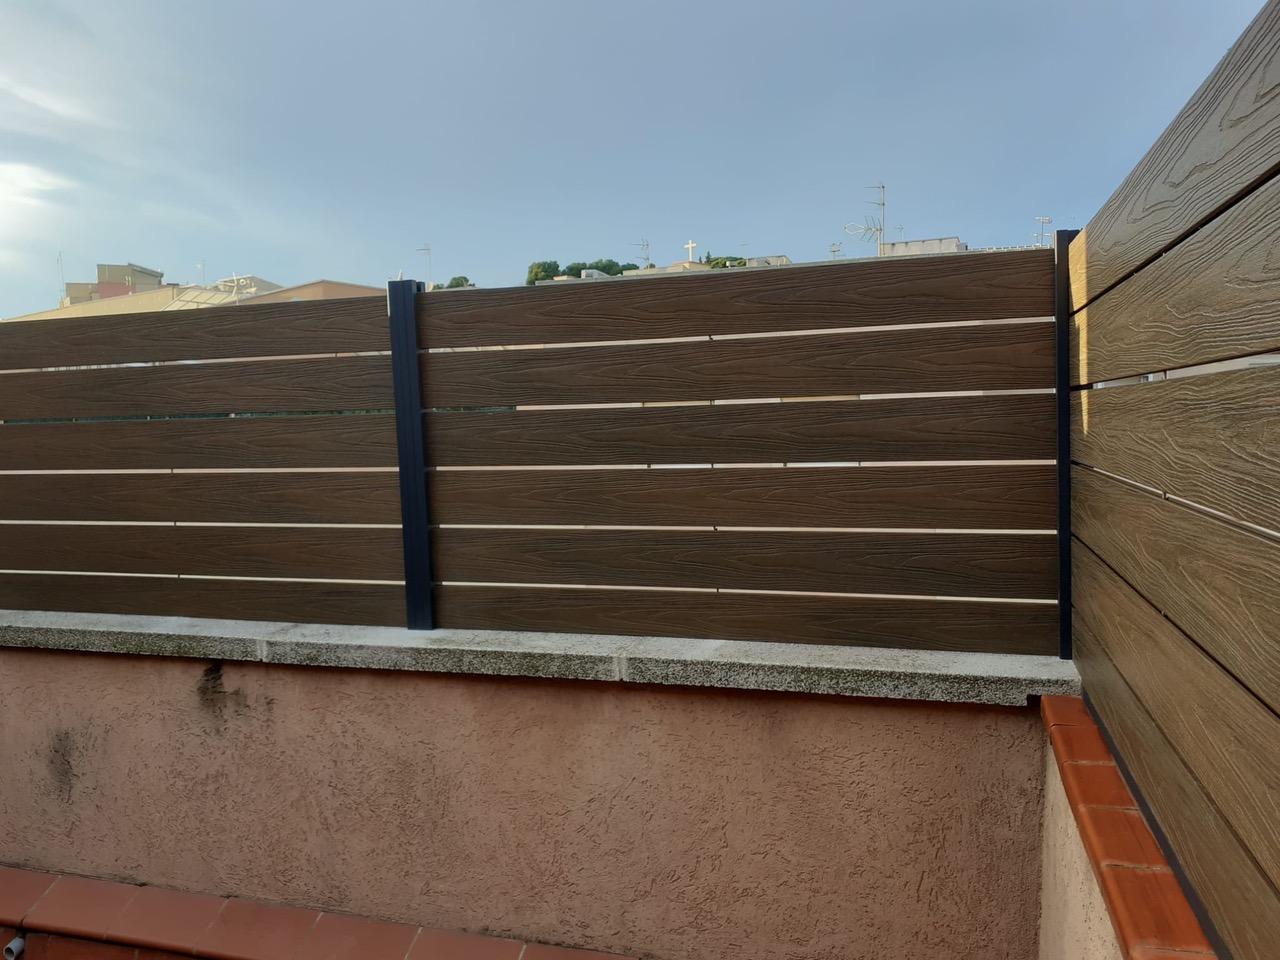 valla de madera tecnológica sintética